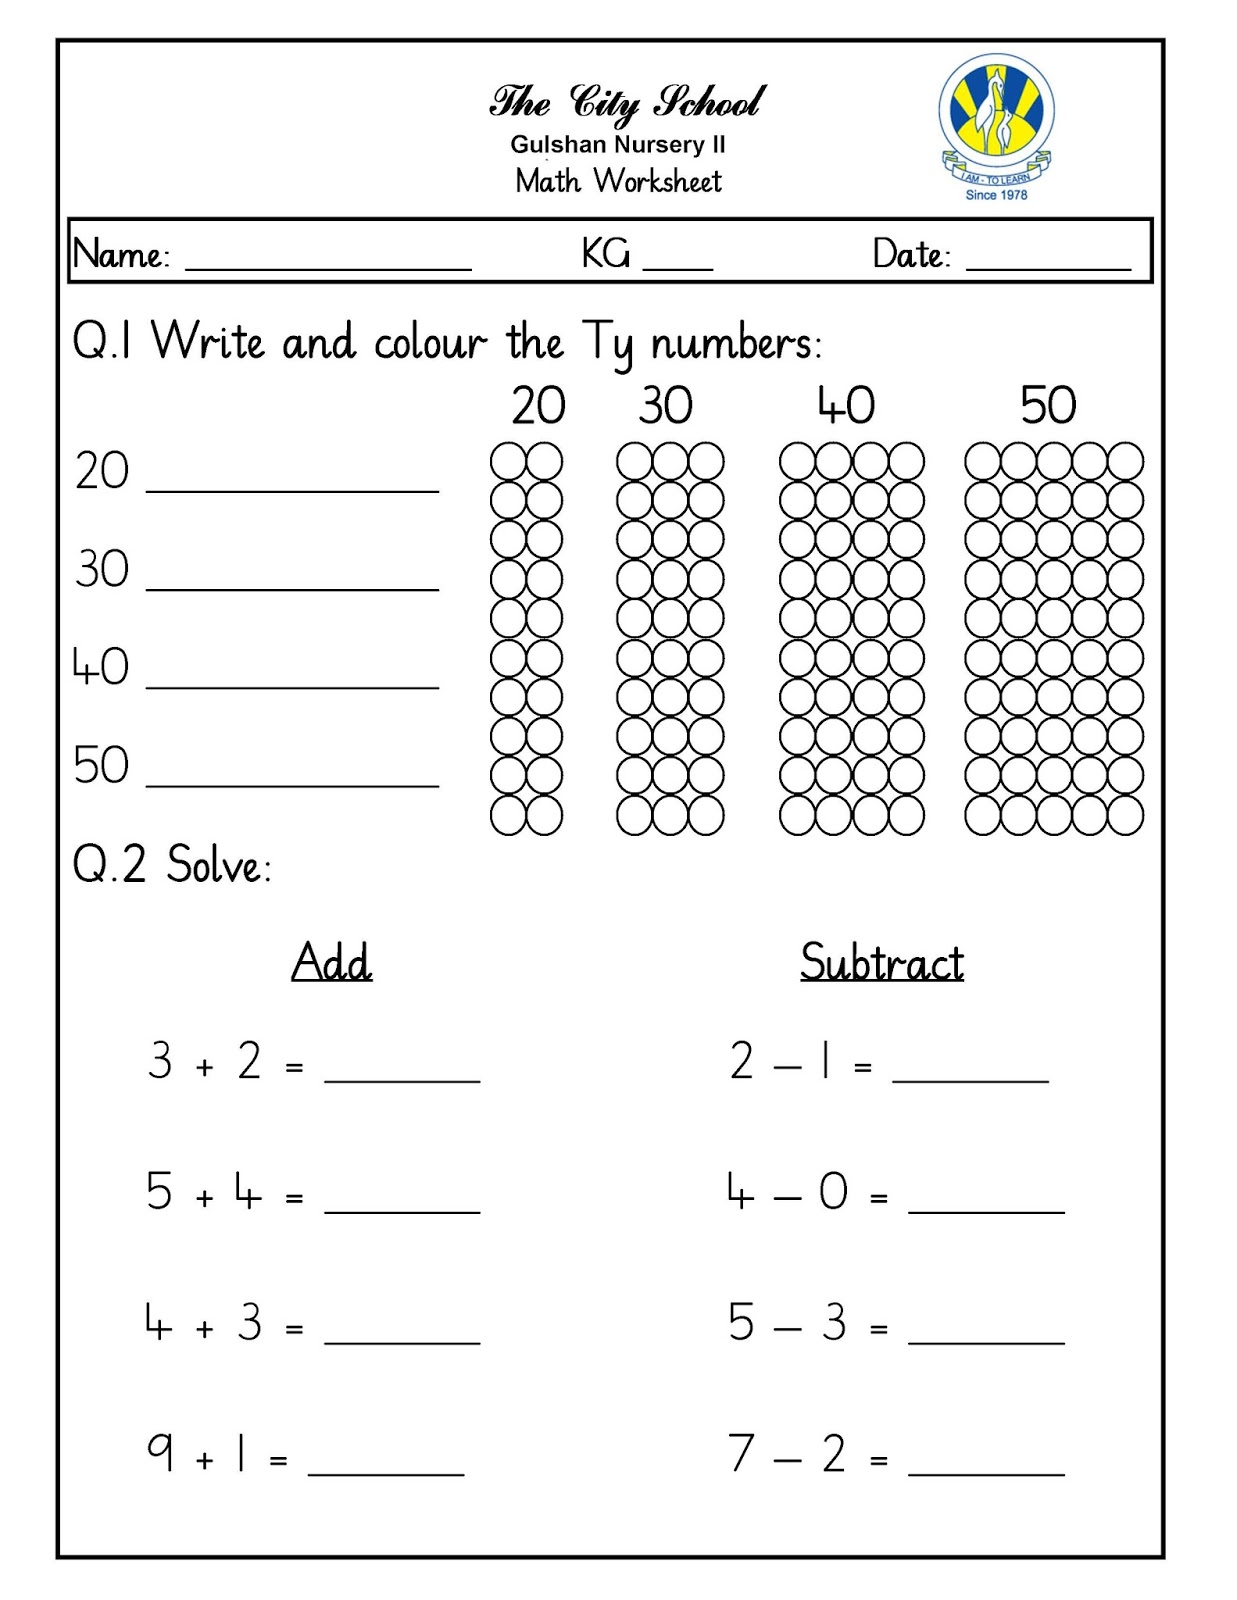 Sr Gulshan The City Nursery Ii Math Kuwa English Worksheets